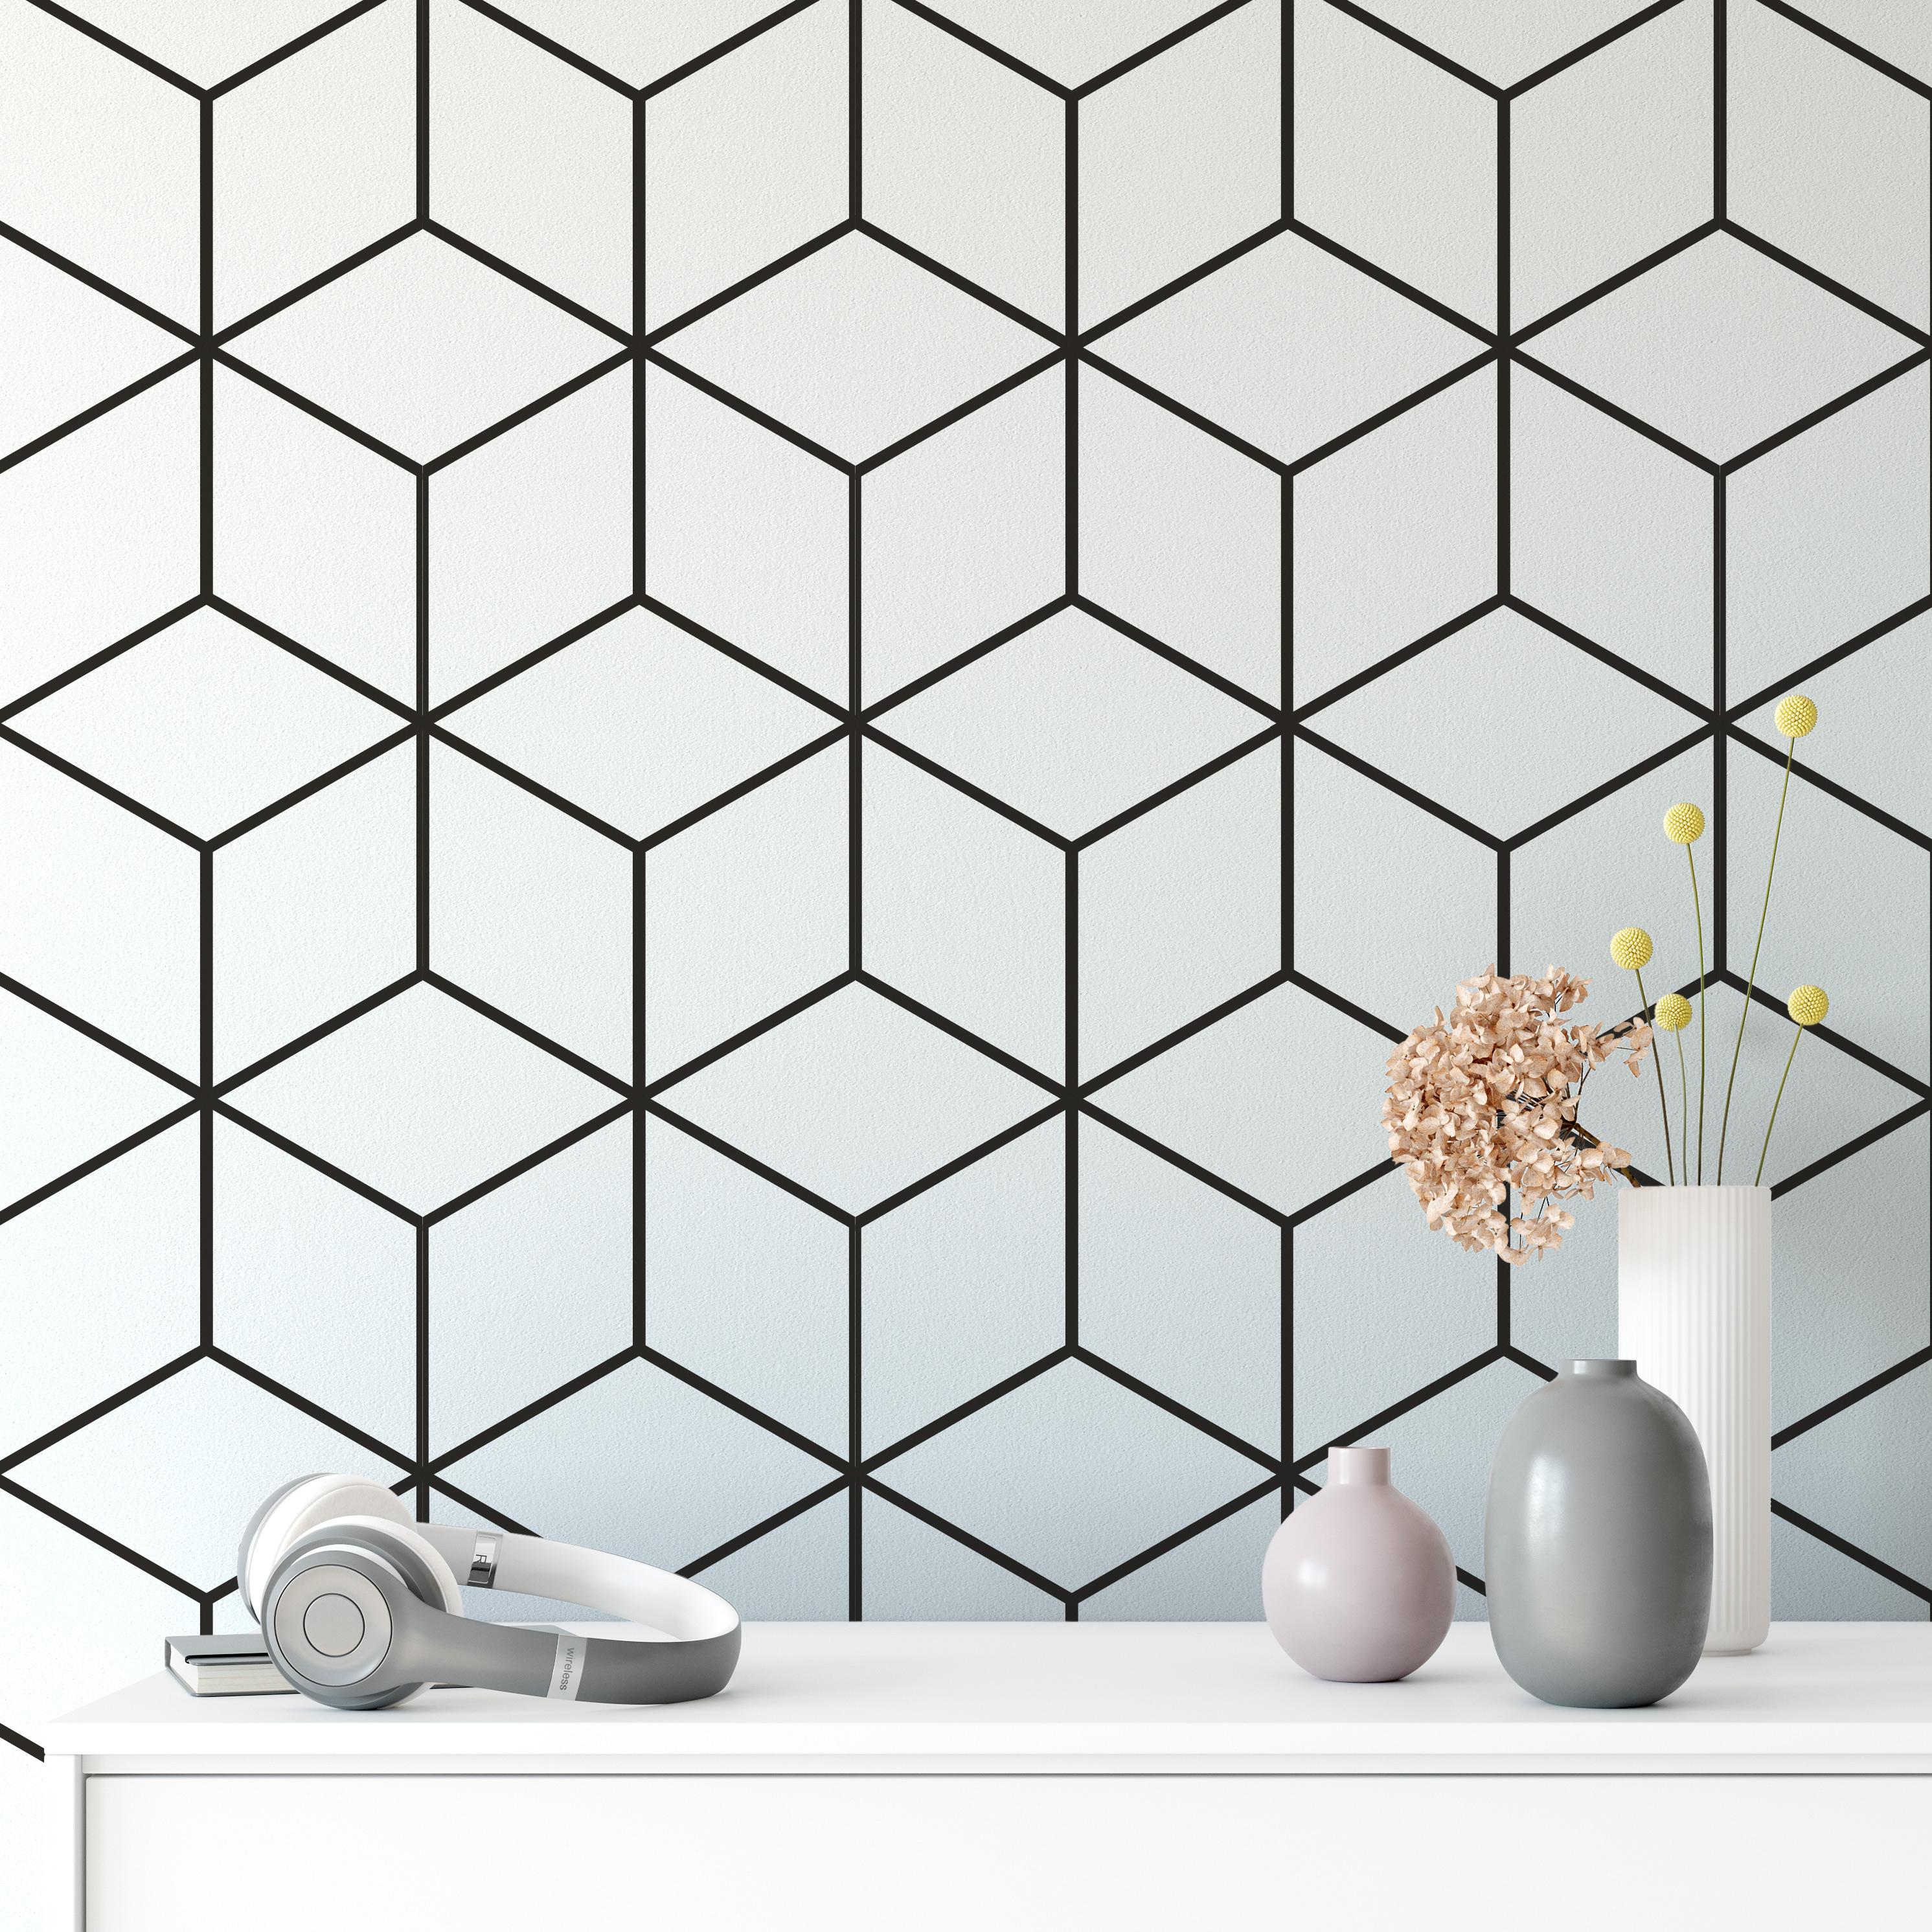 Geometric Cubes Pattern Design Wallpaper Woven Self-Adhesive Wall Art Mural T27